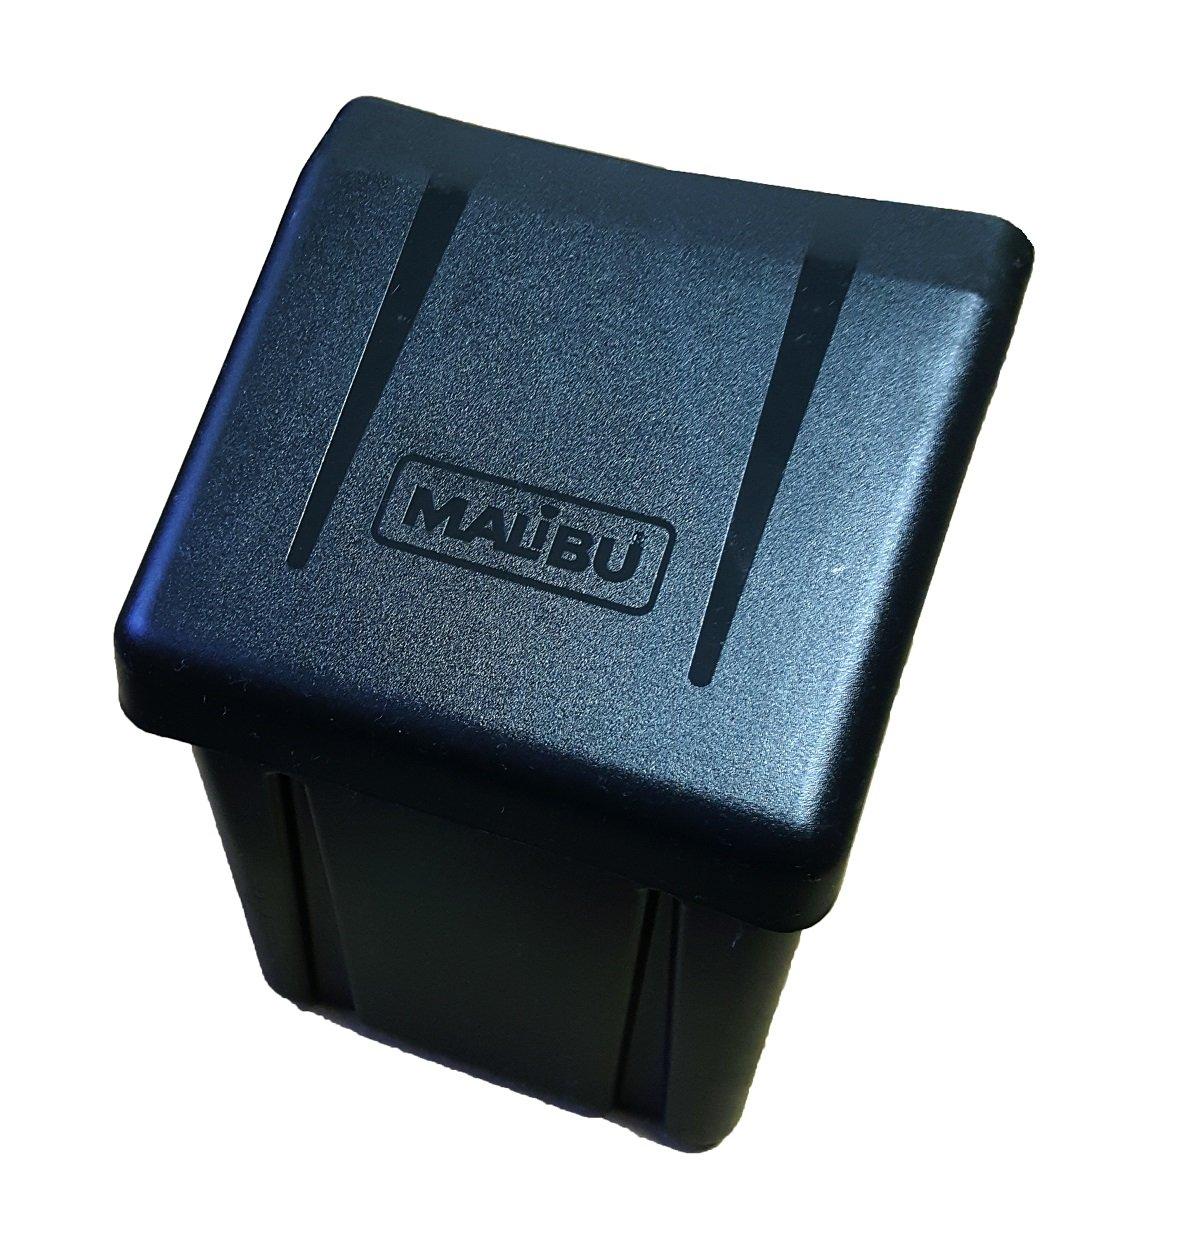 Malibu ML121RT 121 Watt Low Voltage Power Pack Transformer, Black Matte